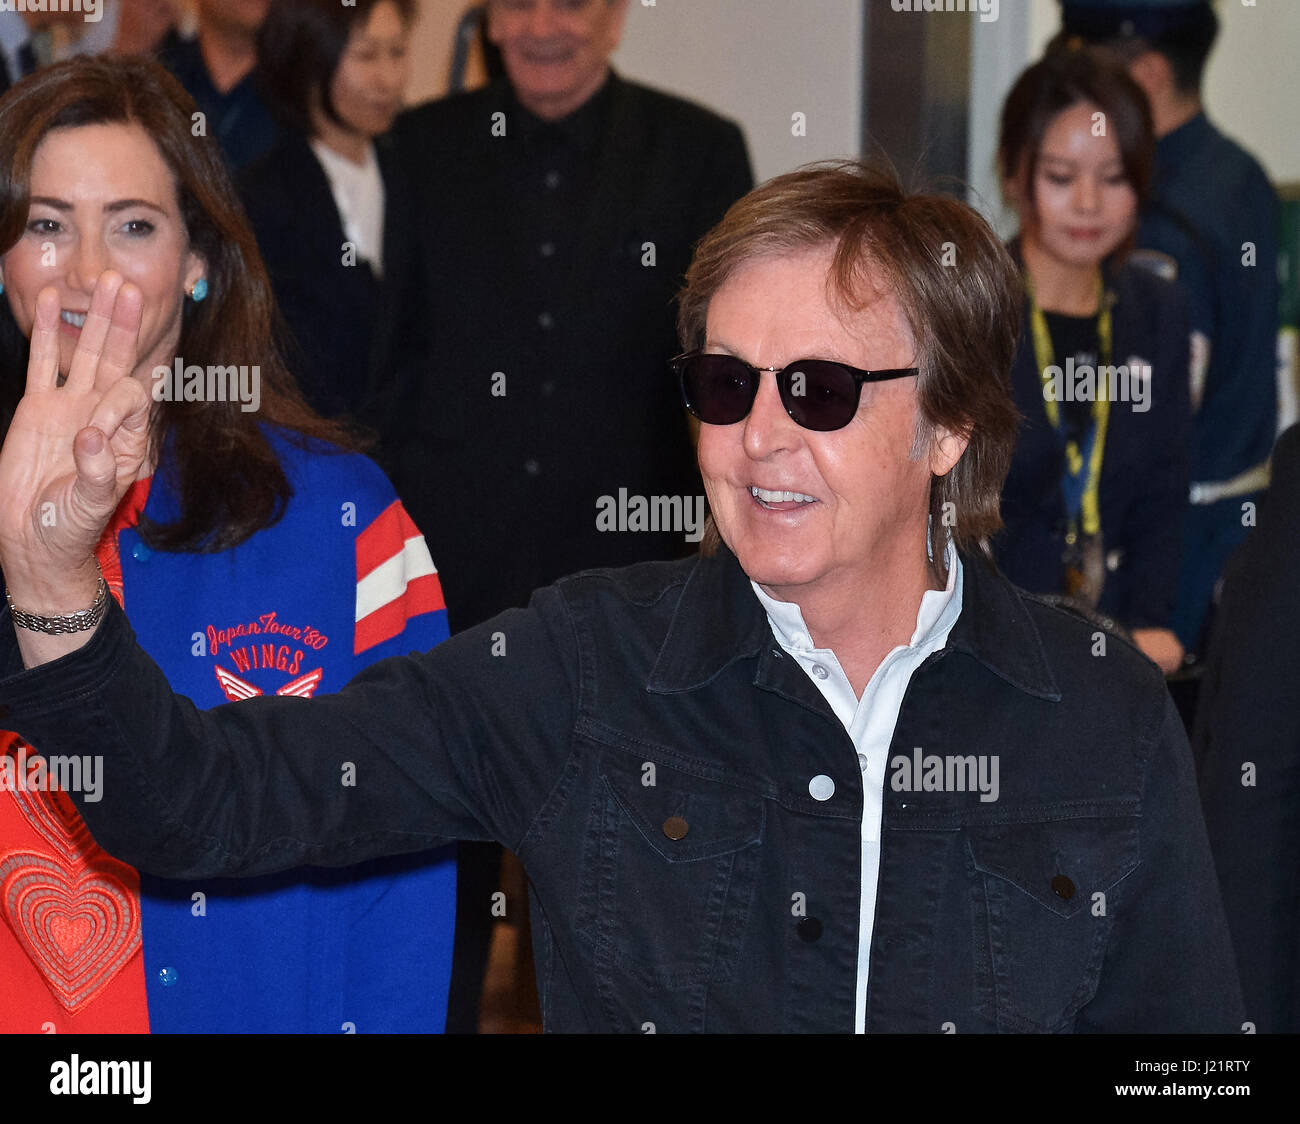 Tokyo, Japan. 23rd Apr, 2017. Paul McCartney, Tokyo, Japan, April 23, 2017 : Sir Paul McCartney arrives at Tokyo - Stock-Bilder